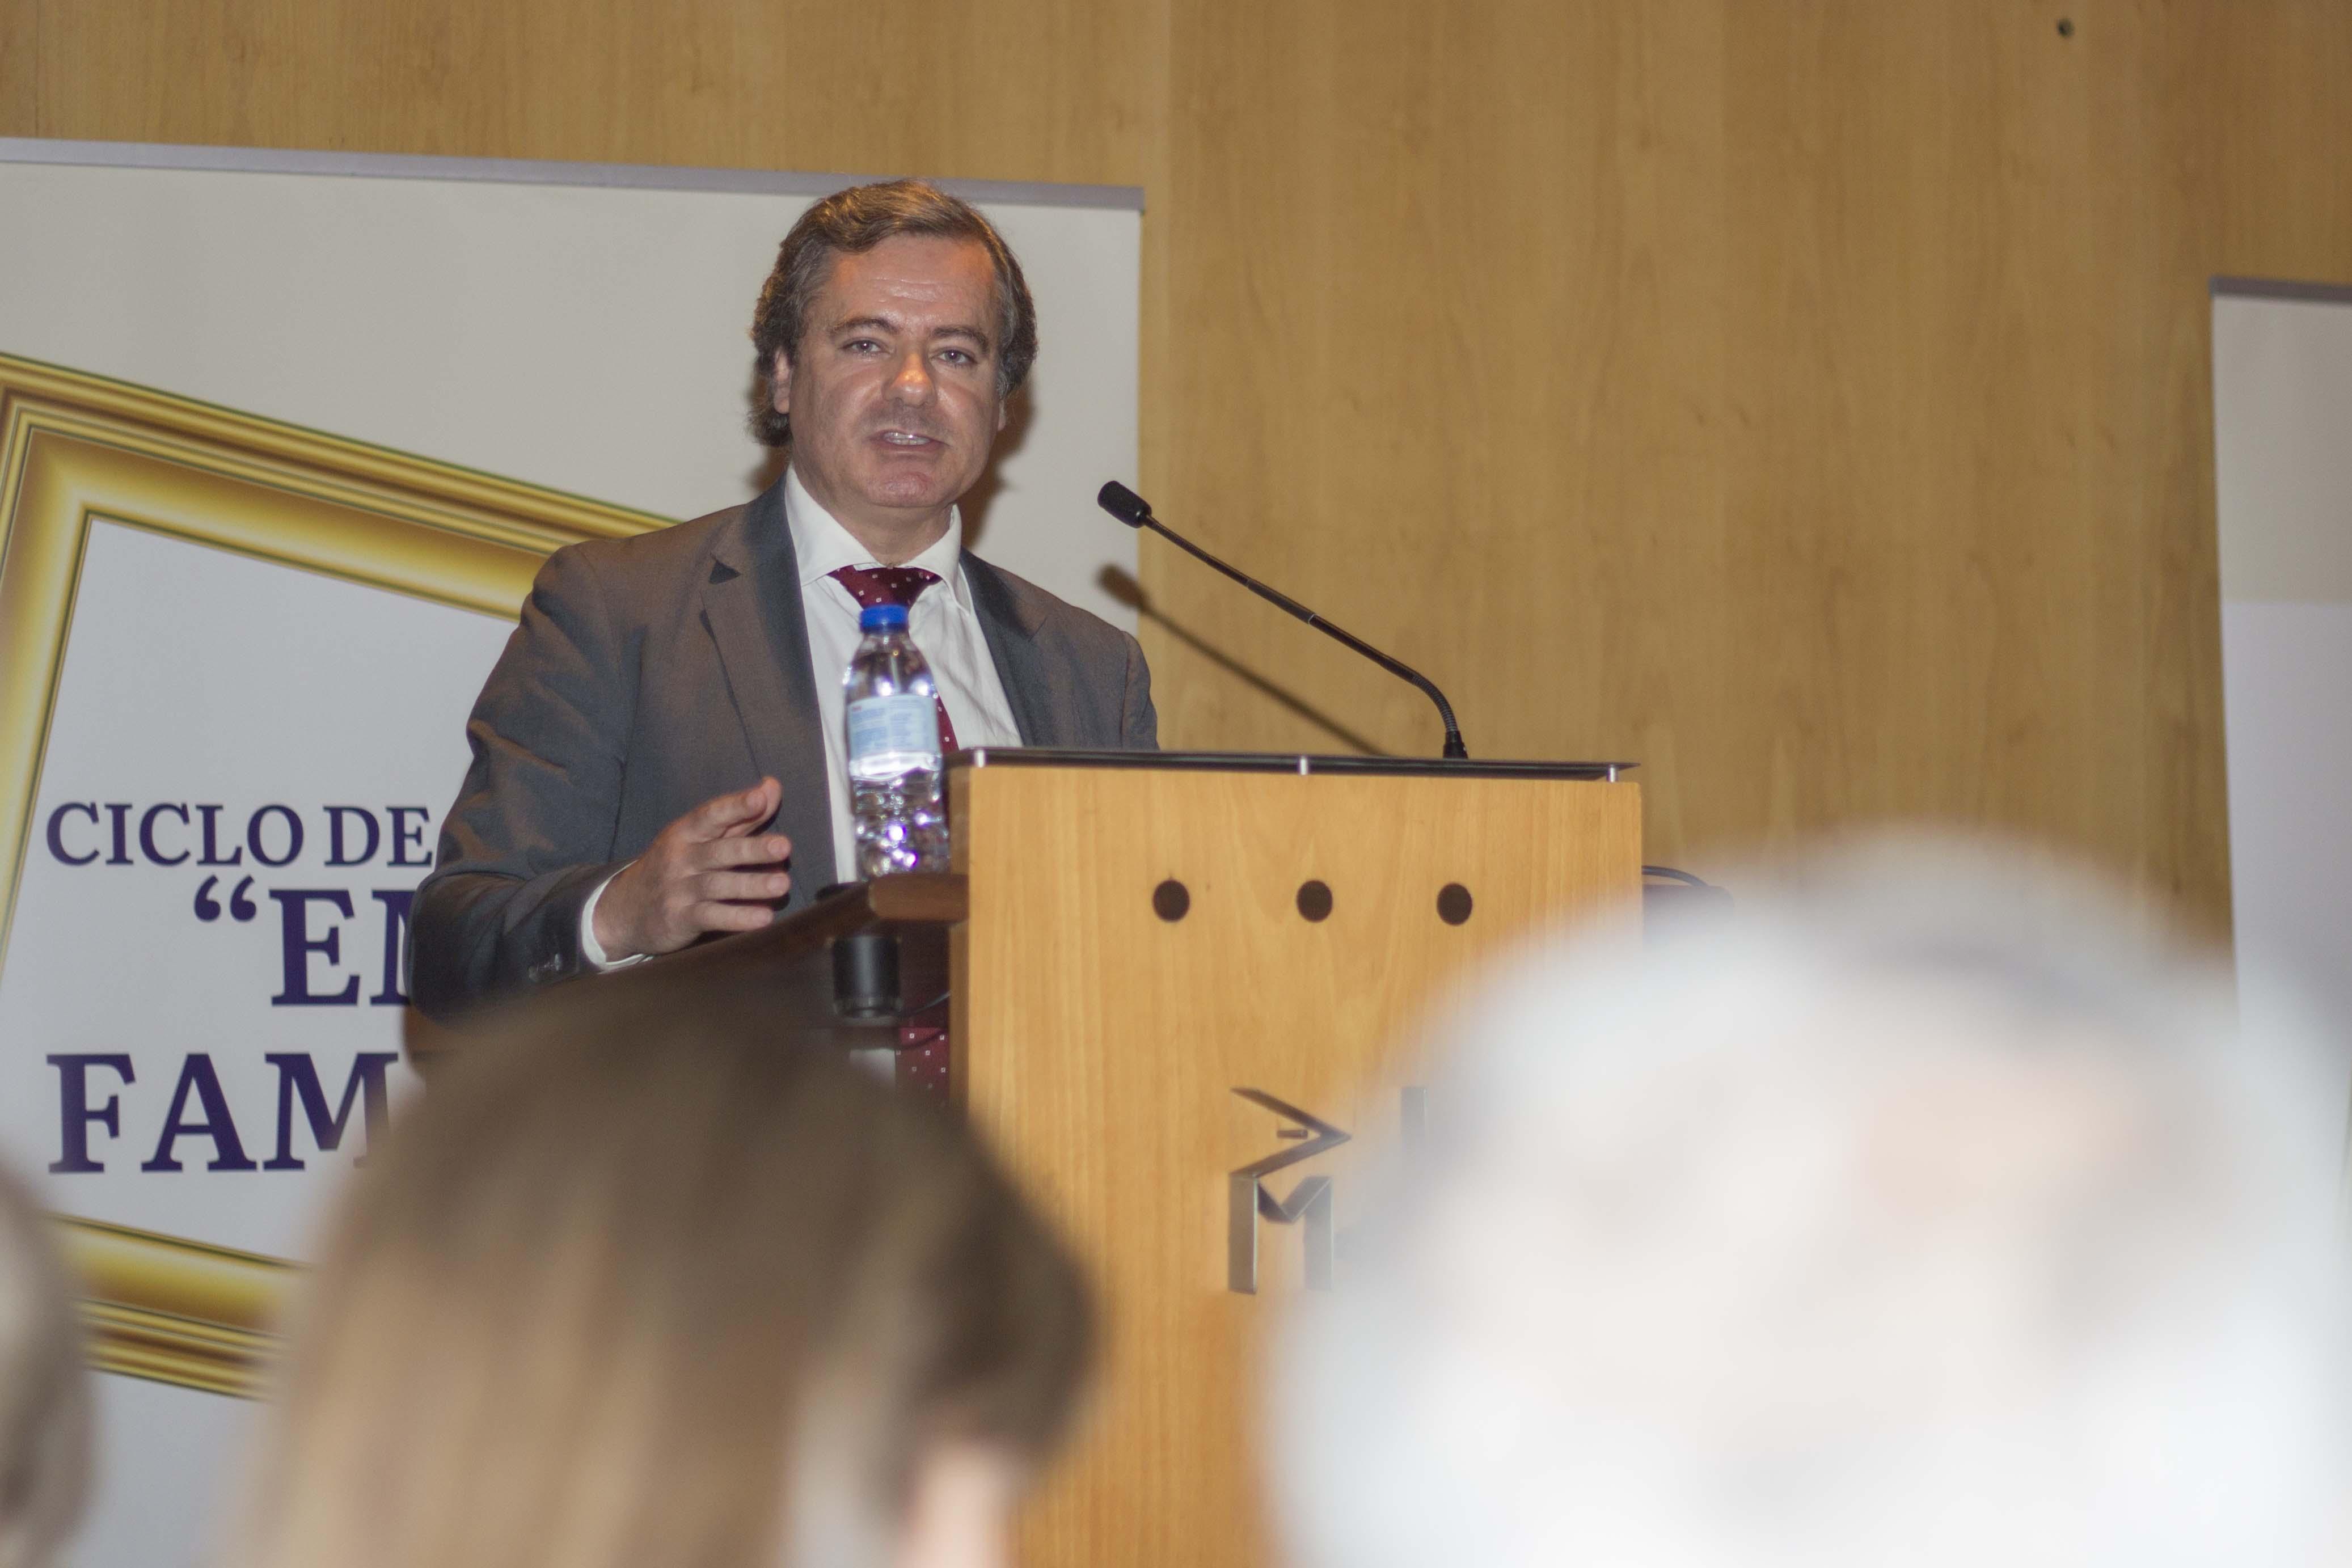 Paulo Ramalho, Vereador